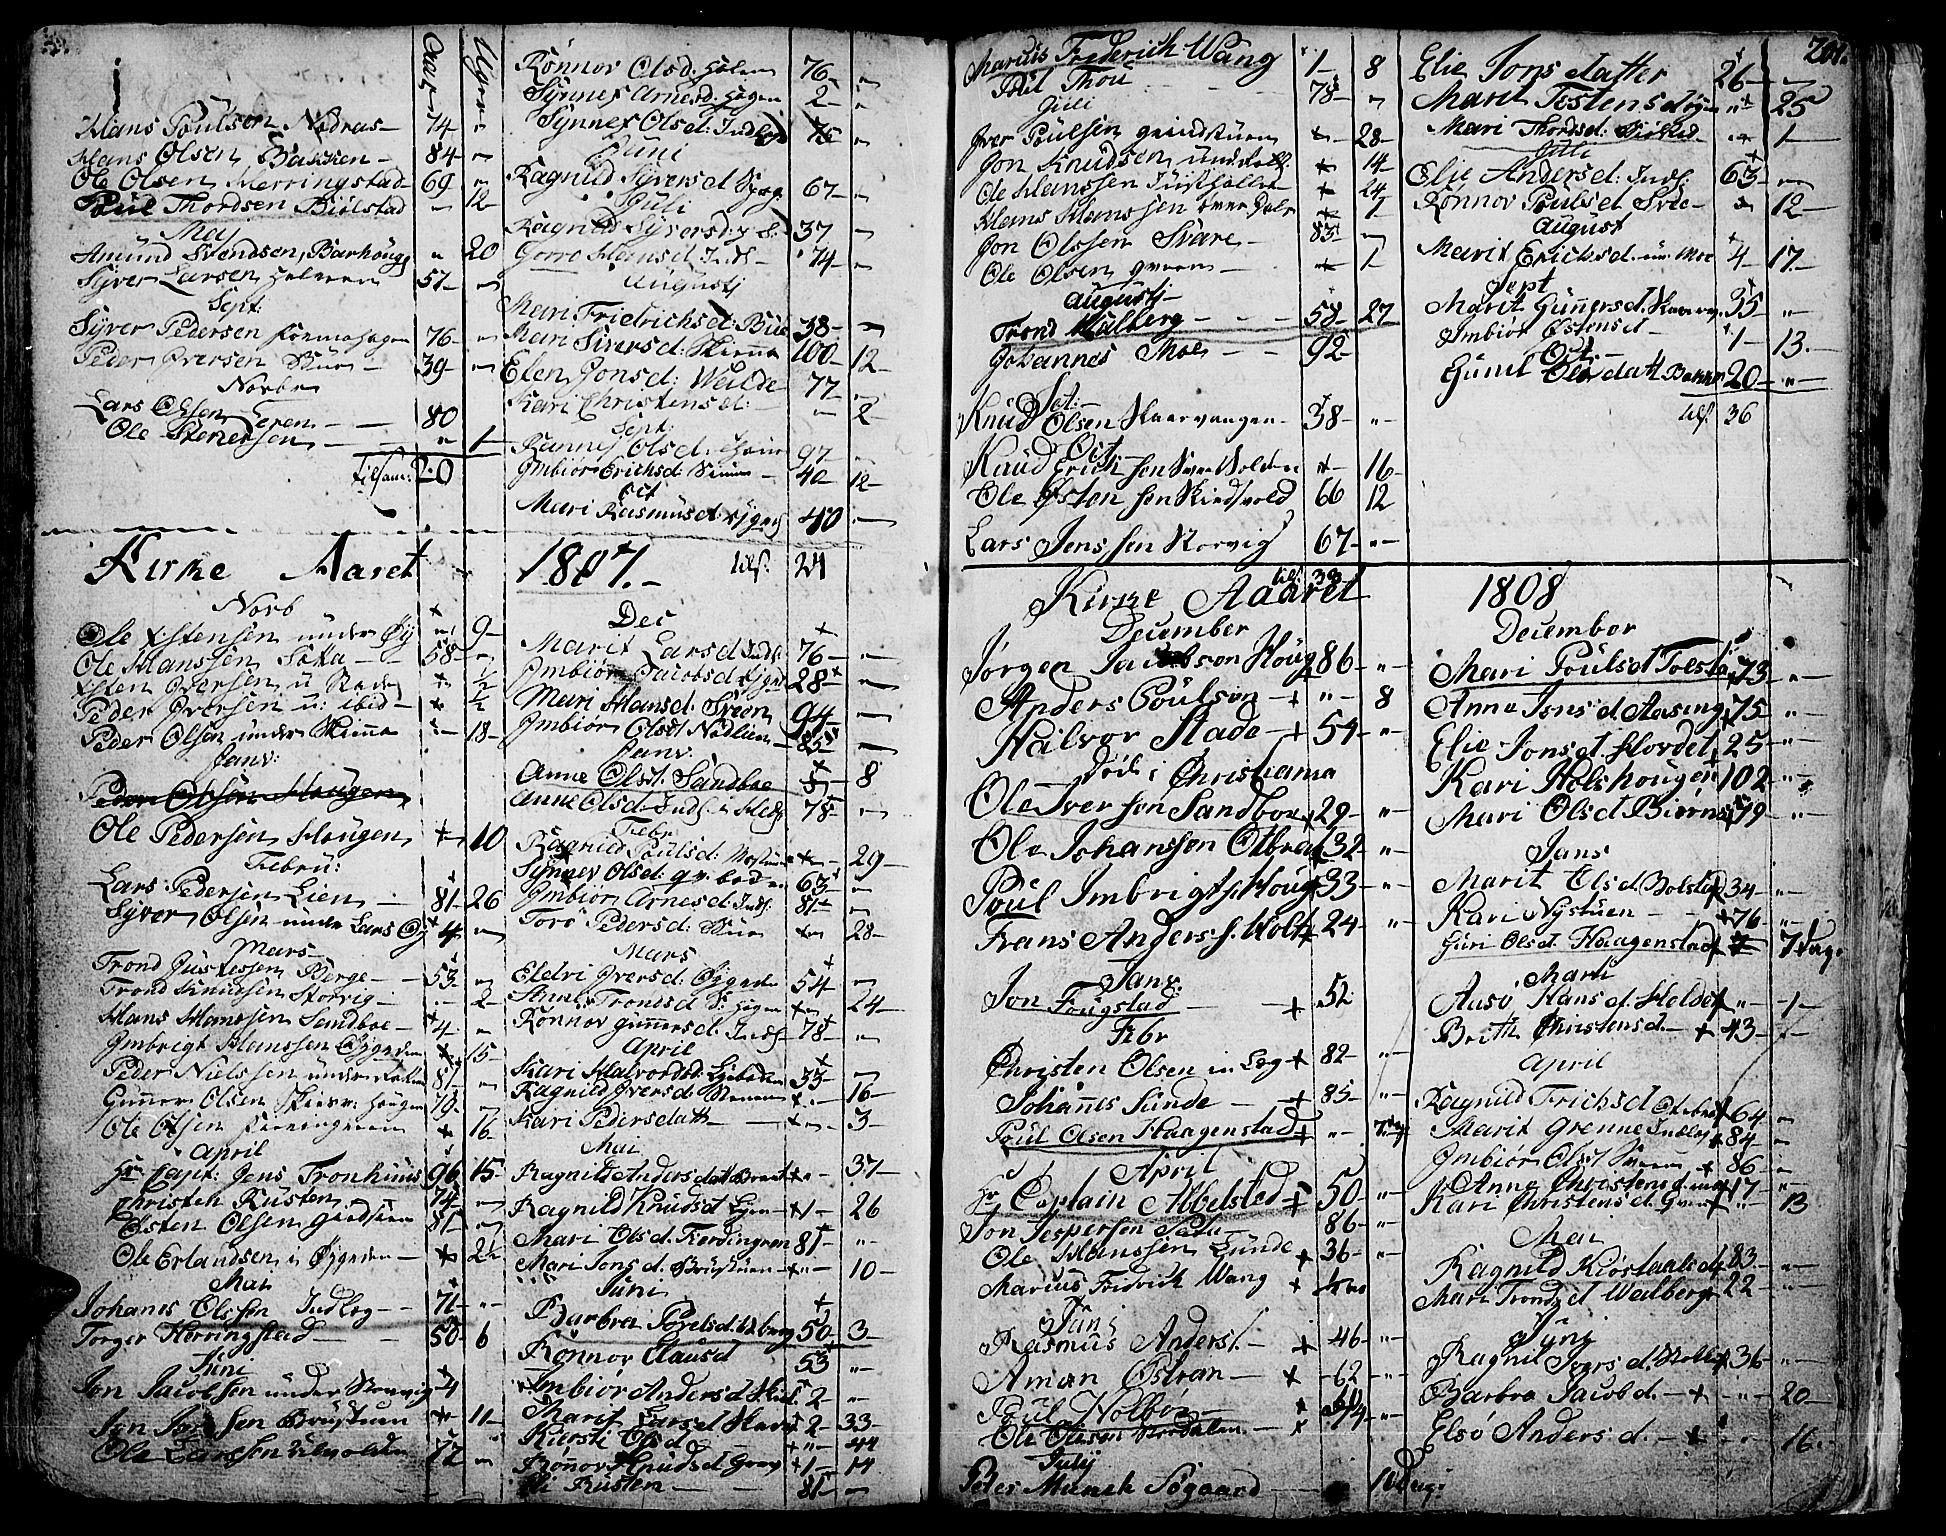 SAH, Vågå prestekontor, Ministerialbok nr. 1, 1739-1810, s. 201